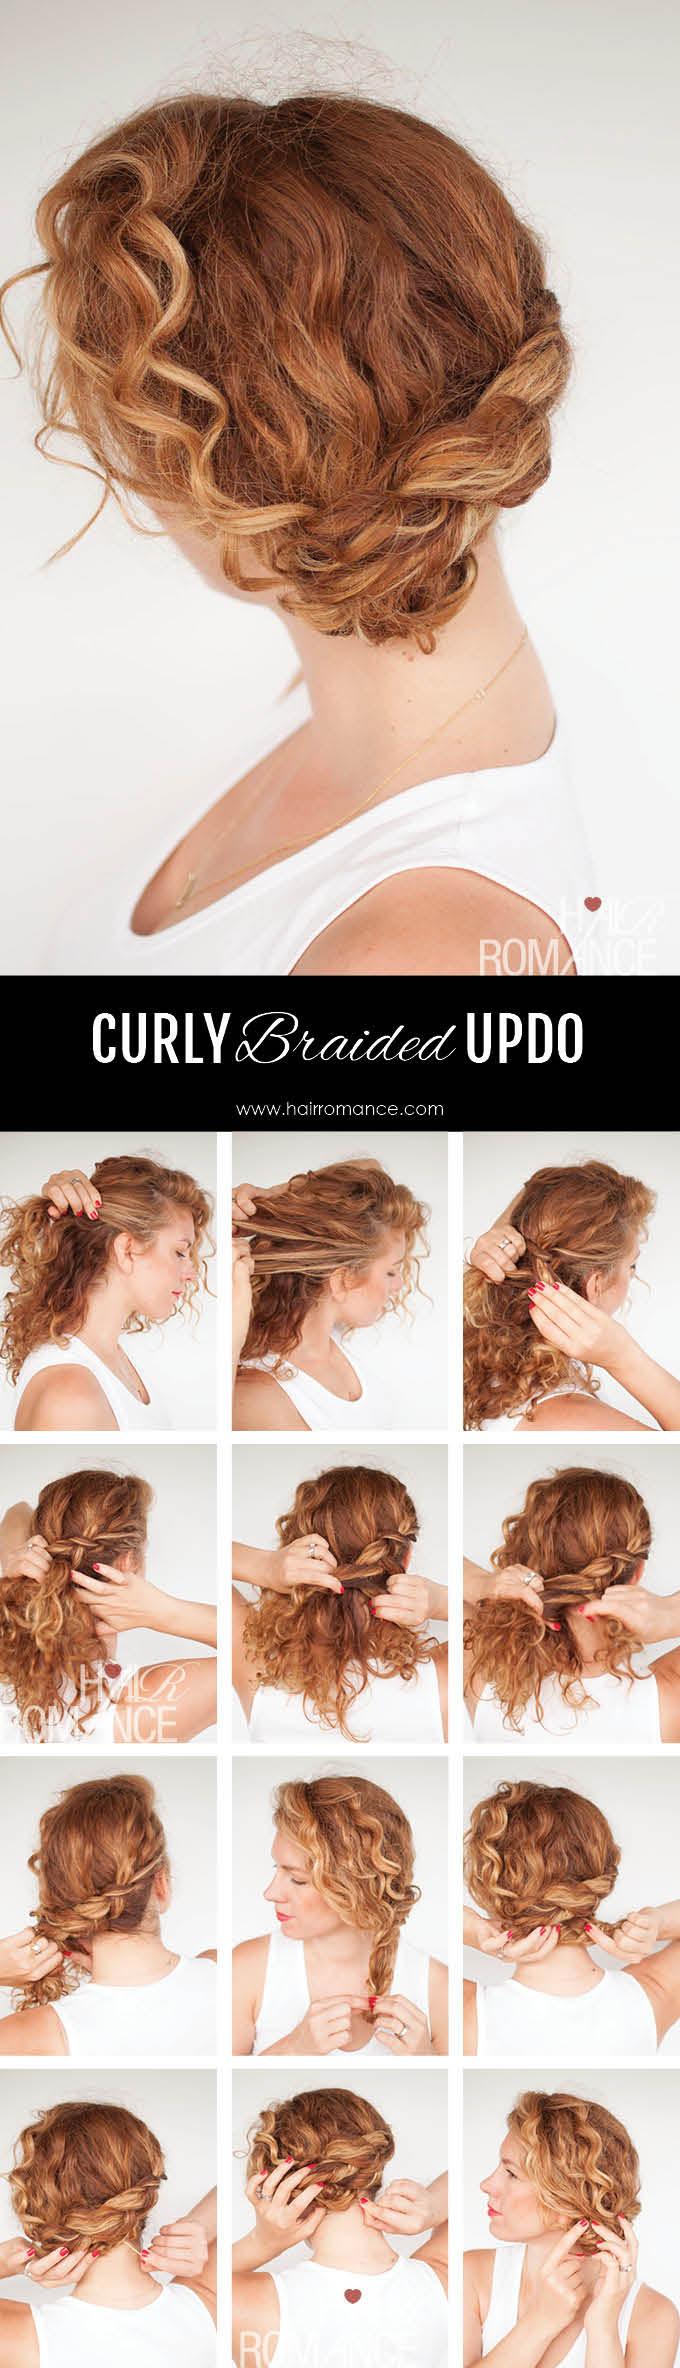 Hairstyles Quiz : Guys Hairstyle Quiz Haircutmodel.us